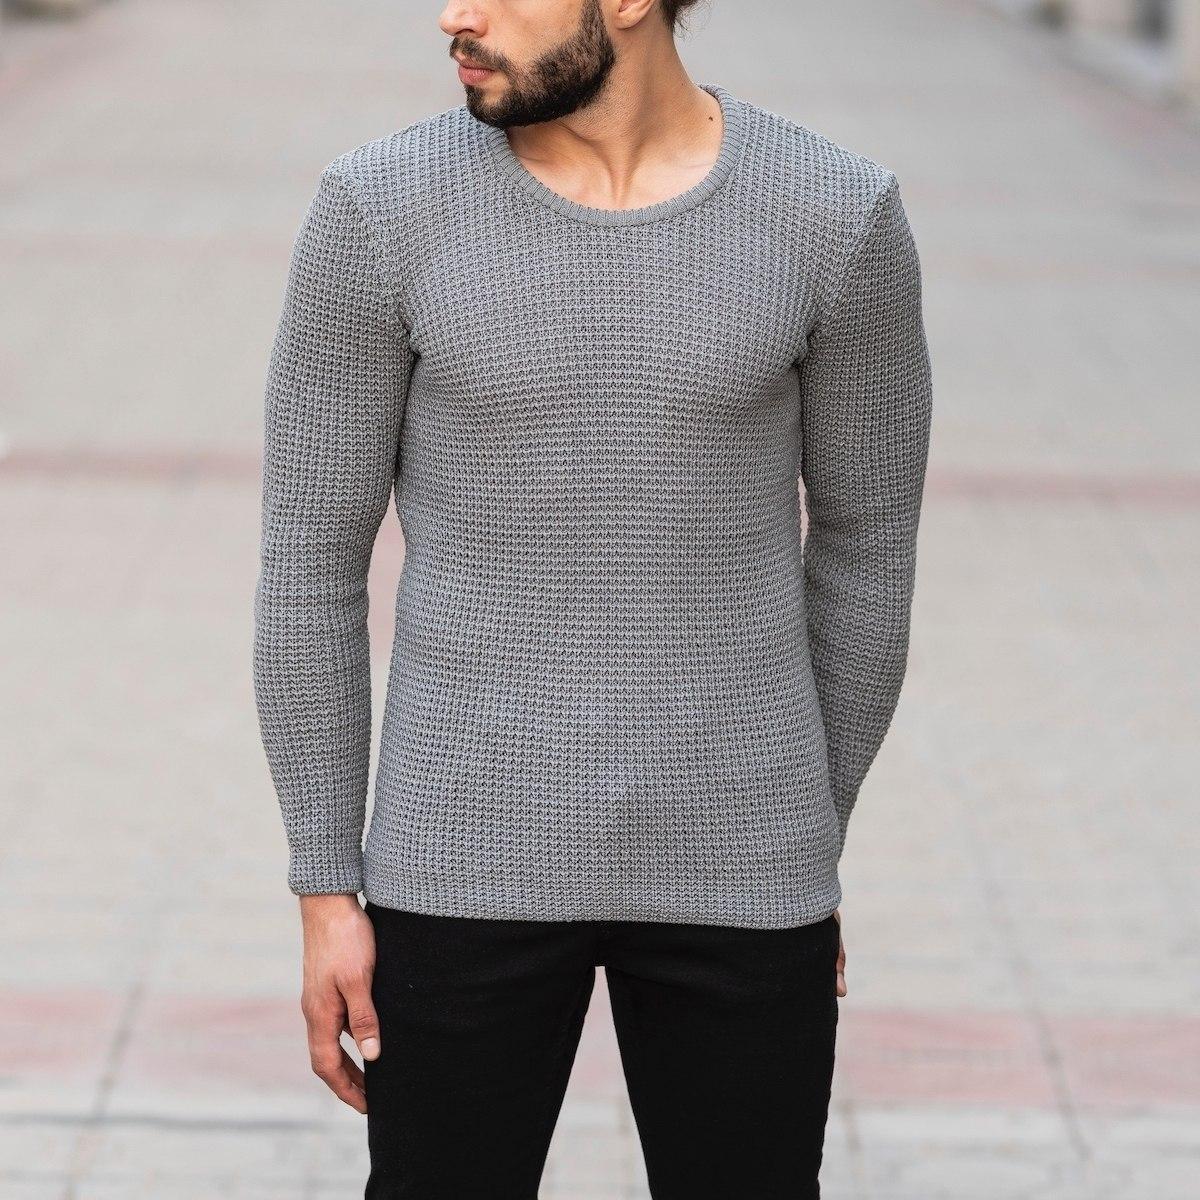 Knitted Pullover In Gray Mv Premium Brand - 1